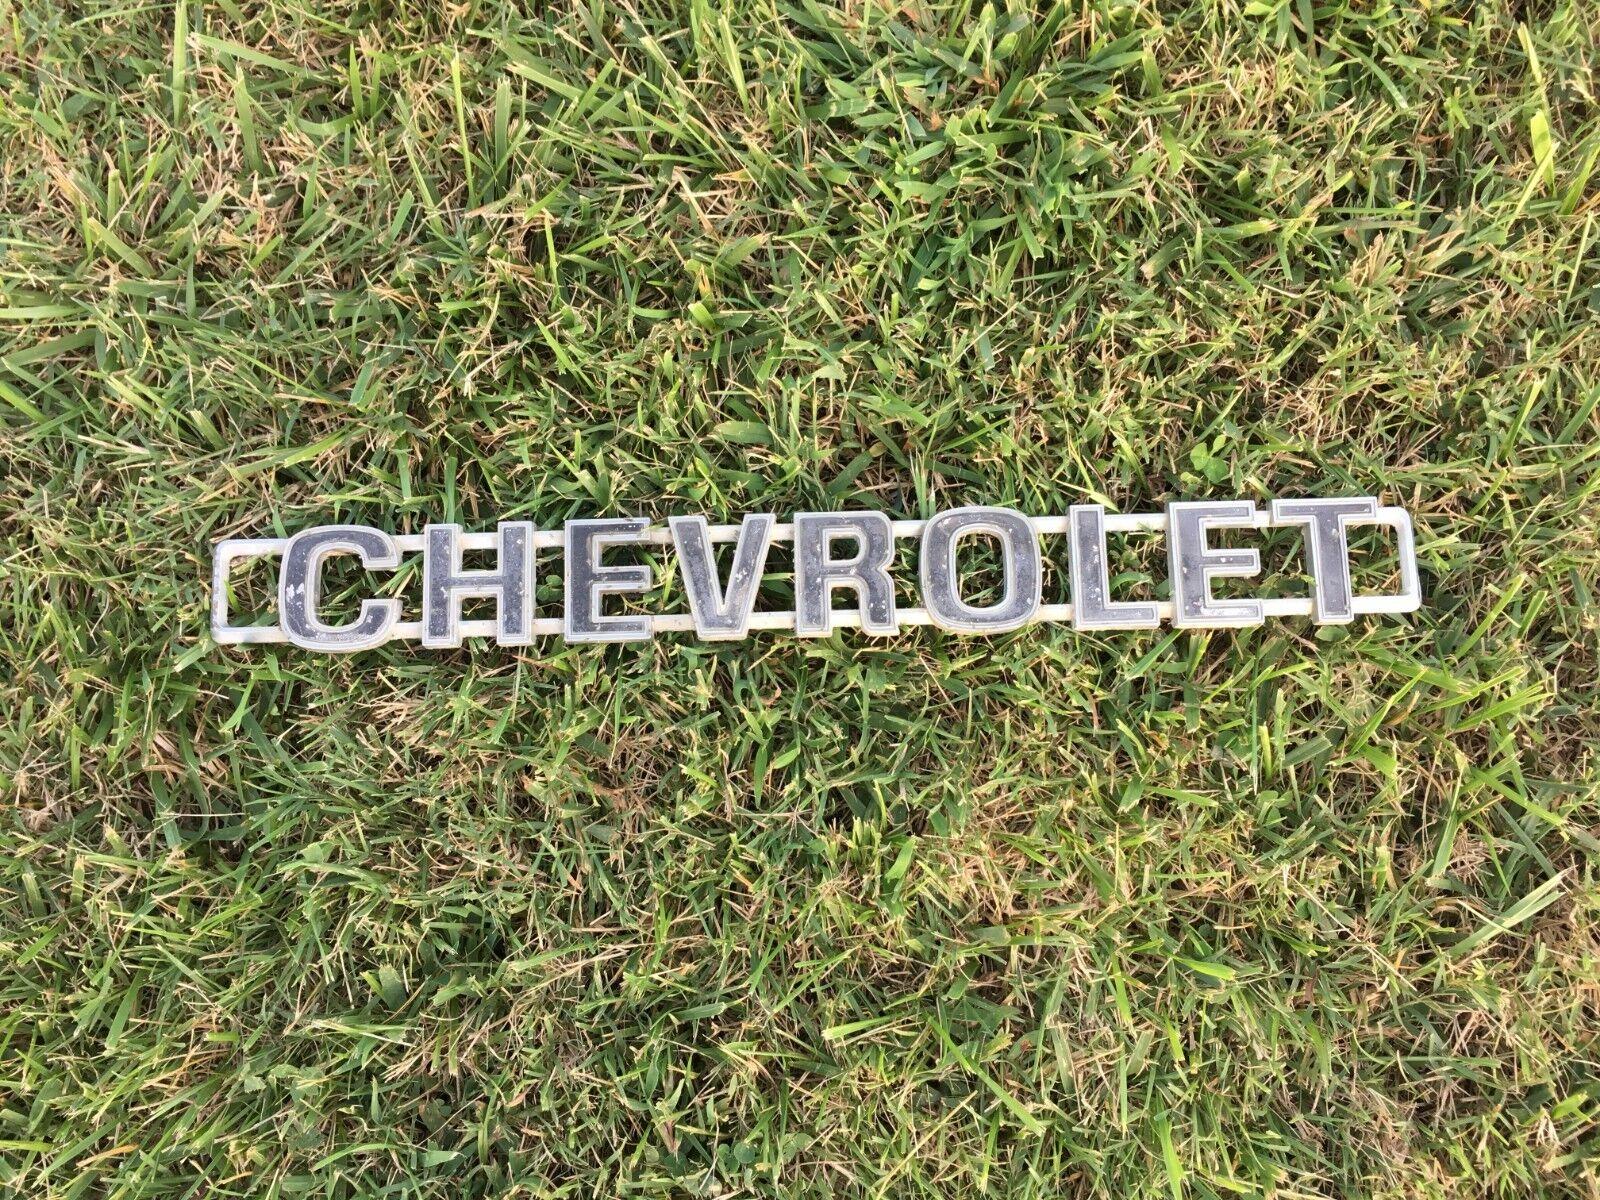 1973 C 1980 original logo metal name marke gm chevrolet.